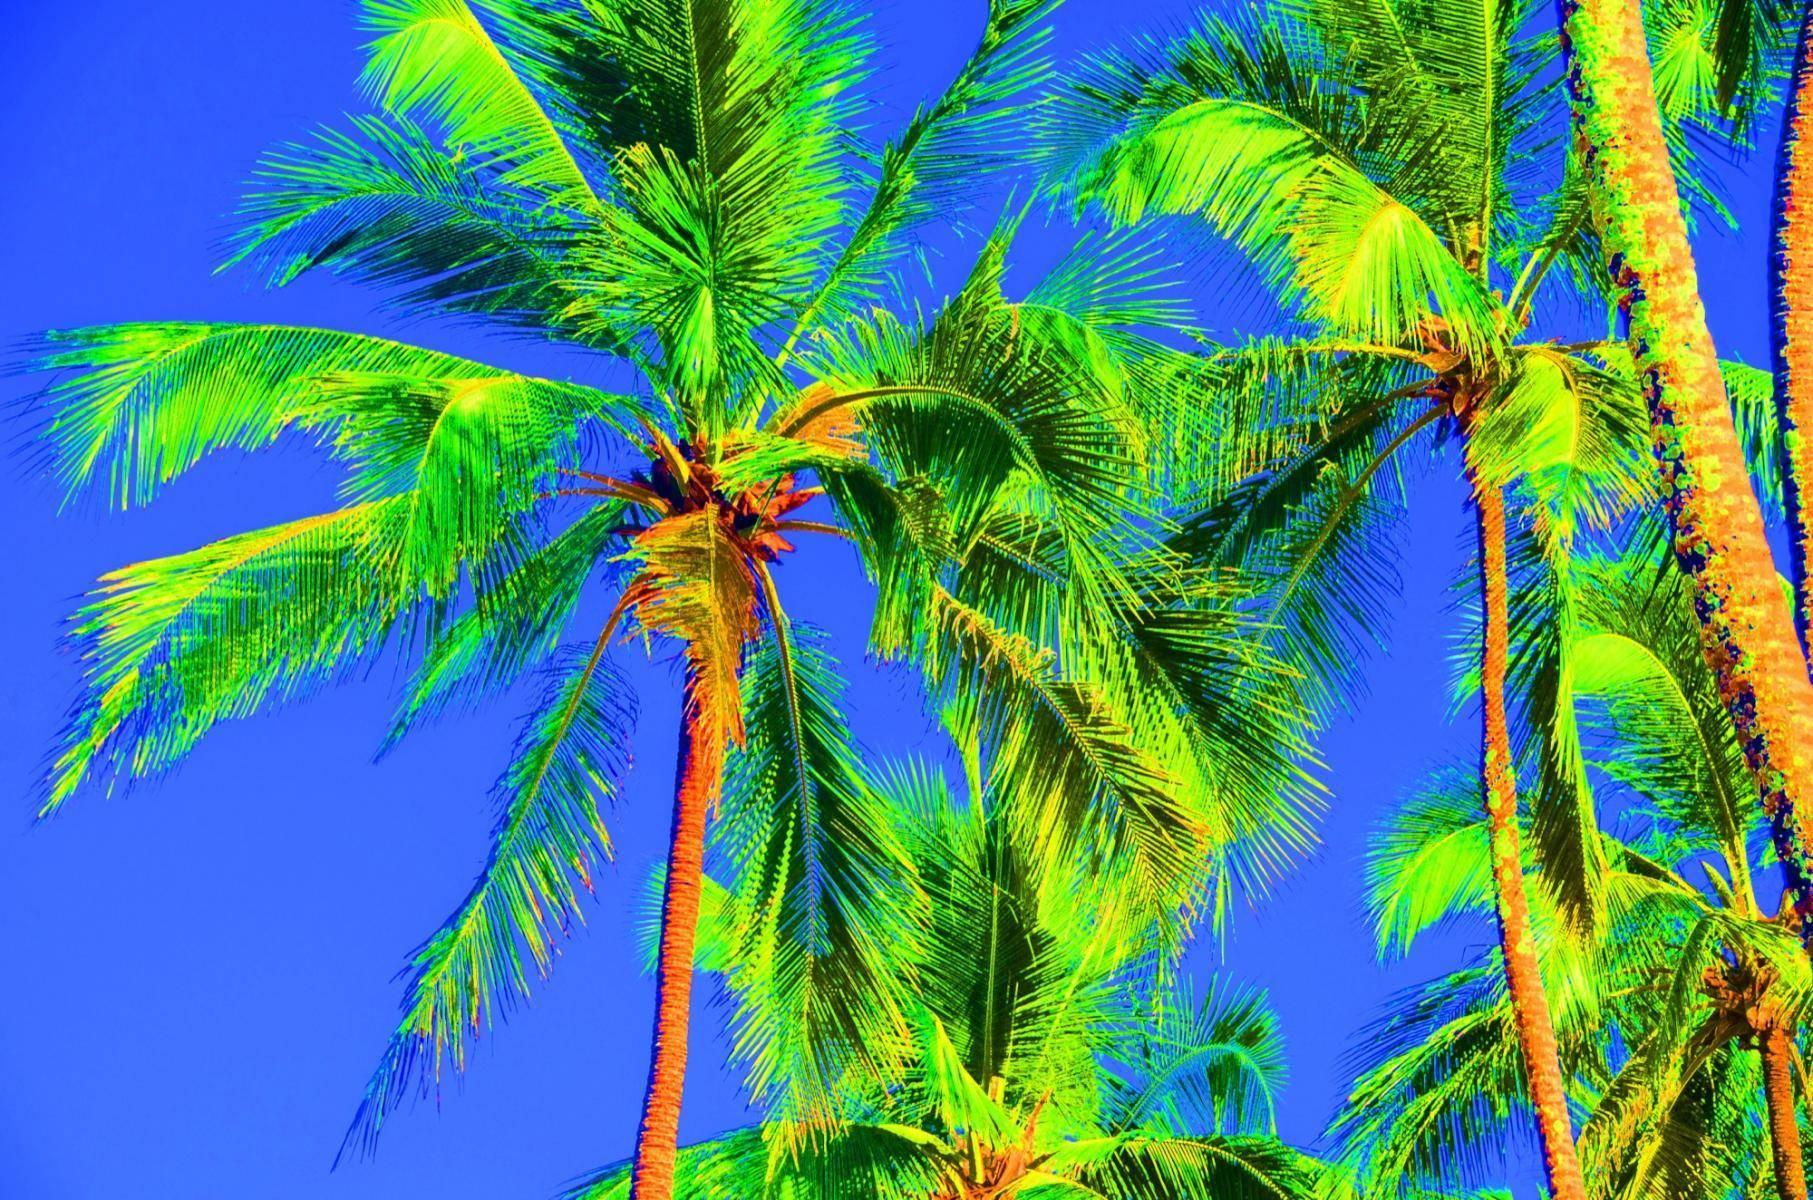 Palmenträume